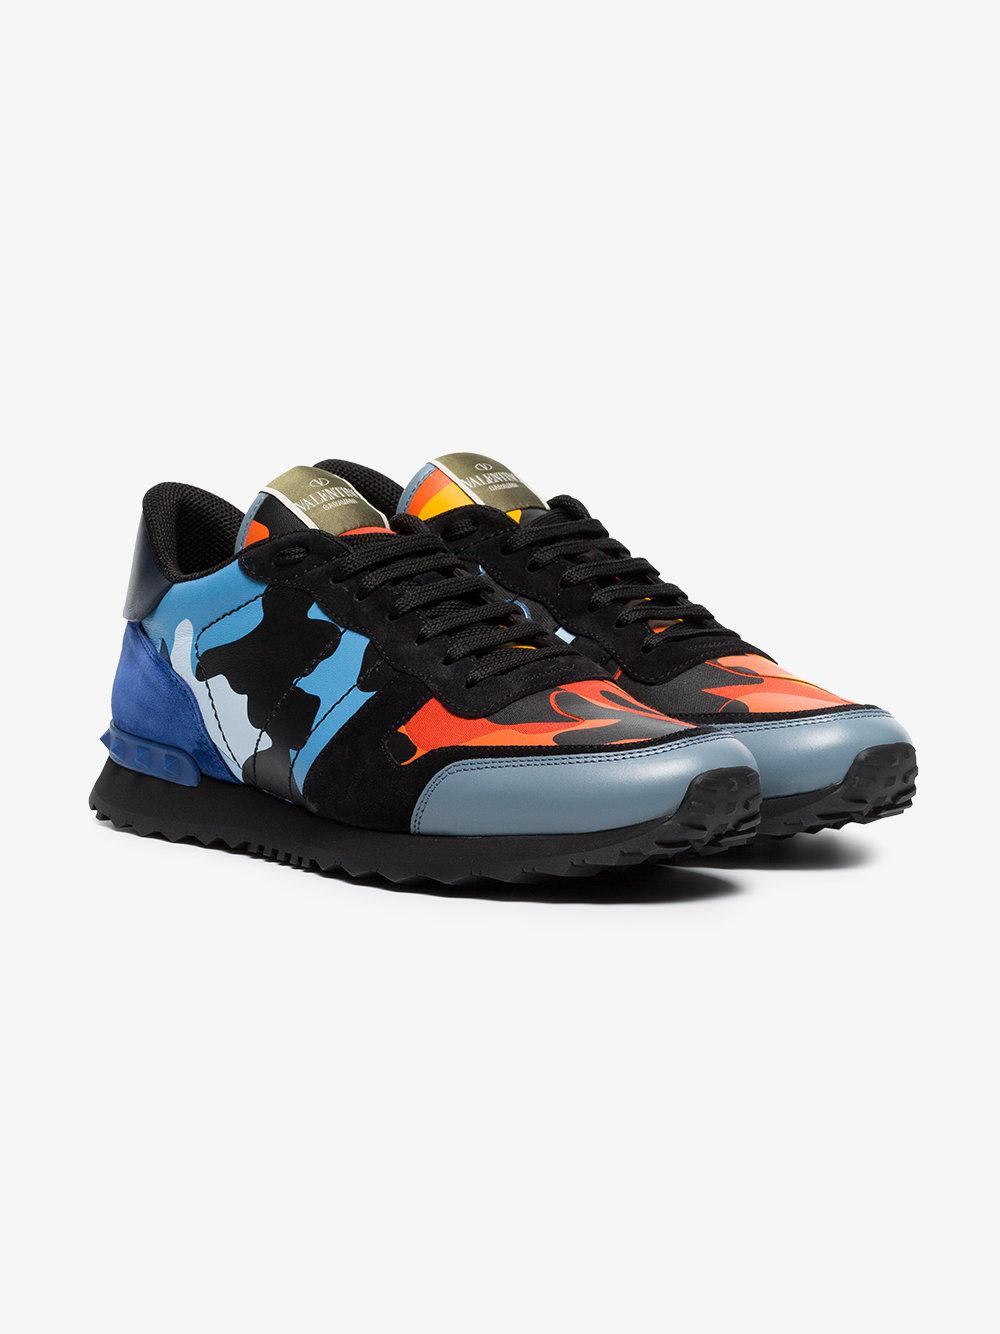 Valentino Black, Blue And Orange